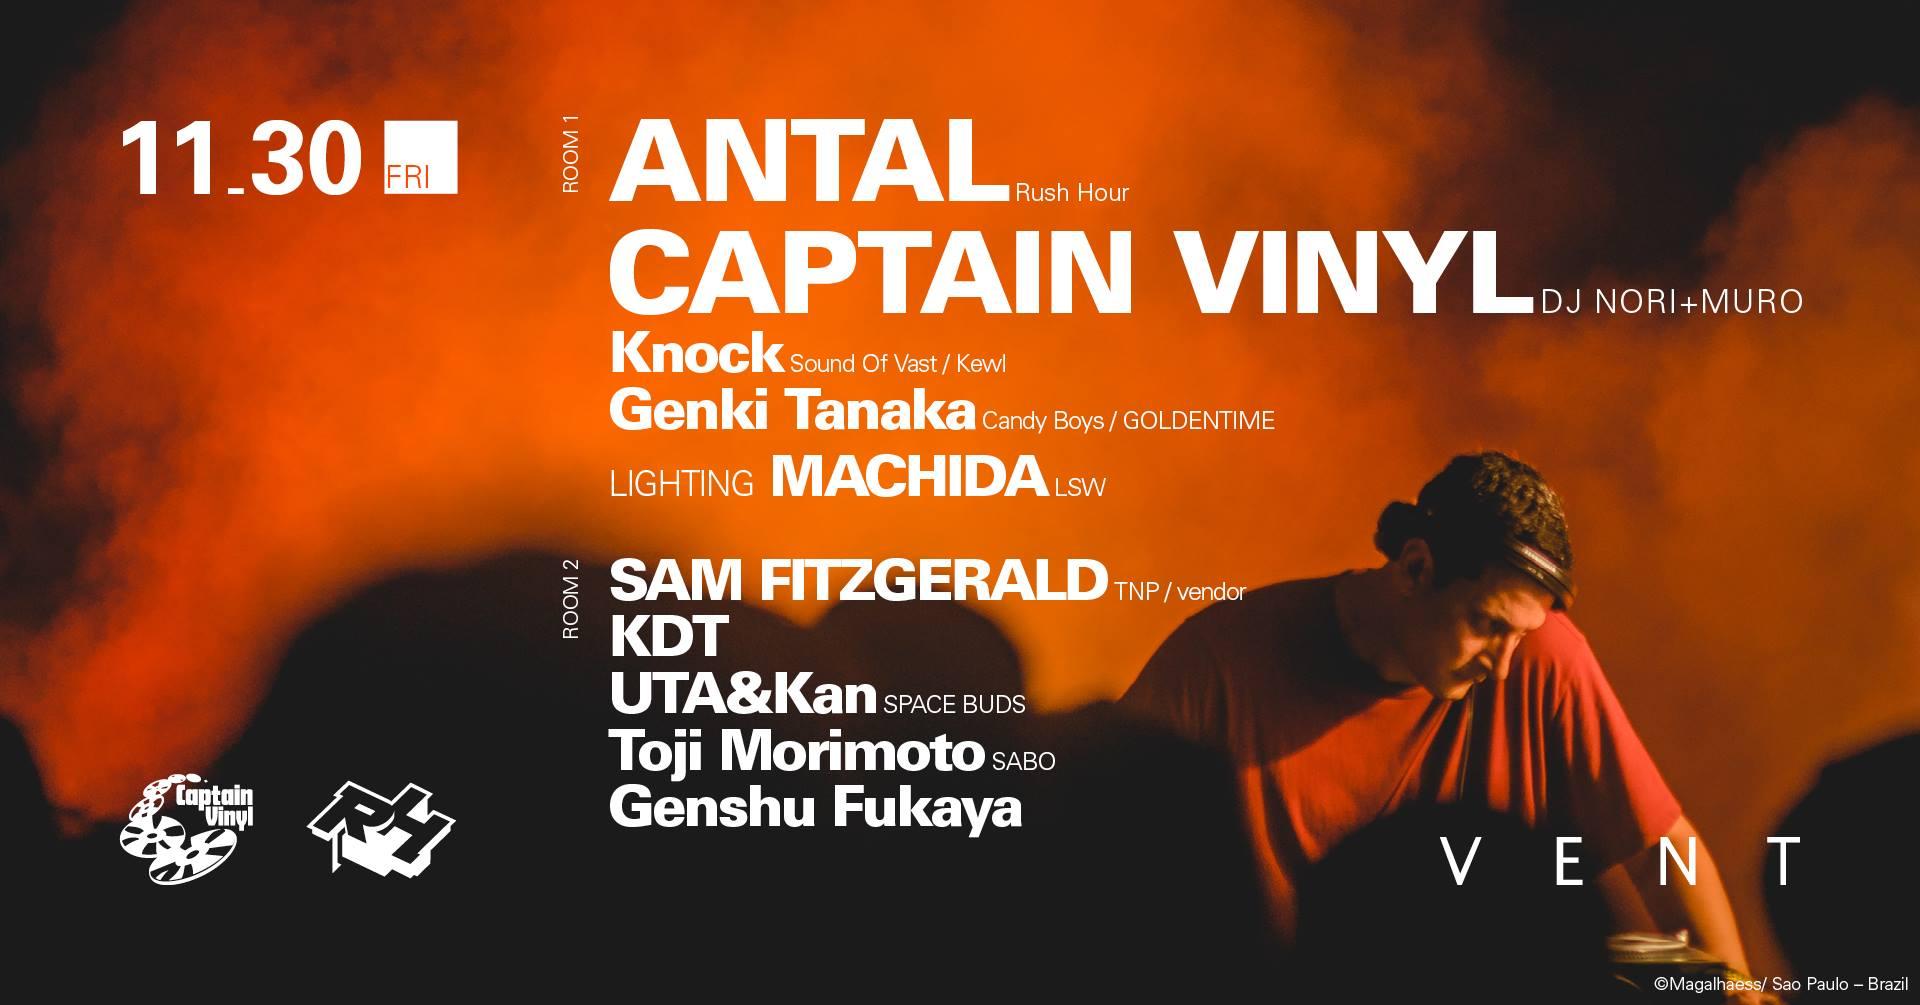 antal captain vinyl